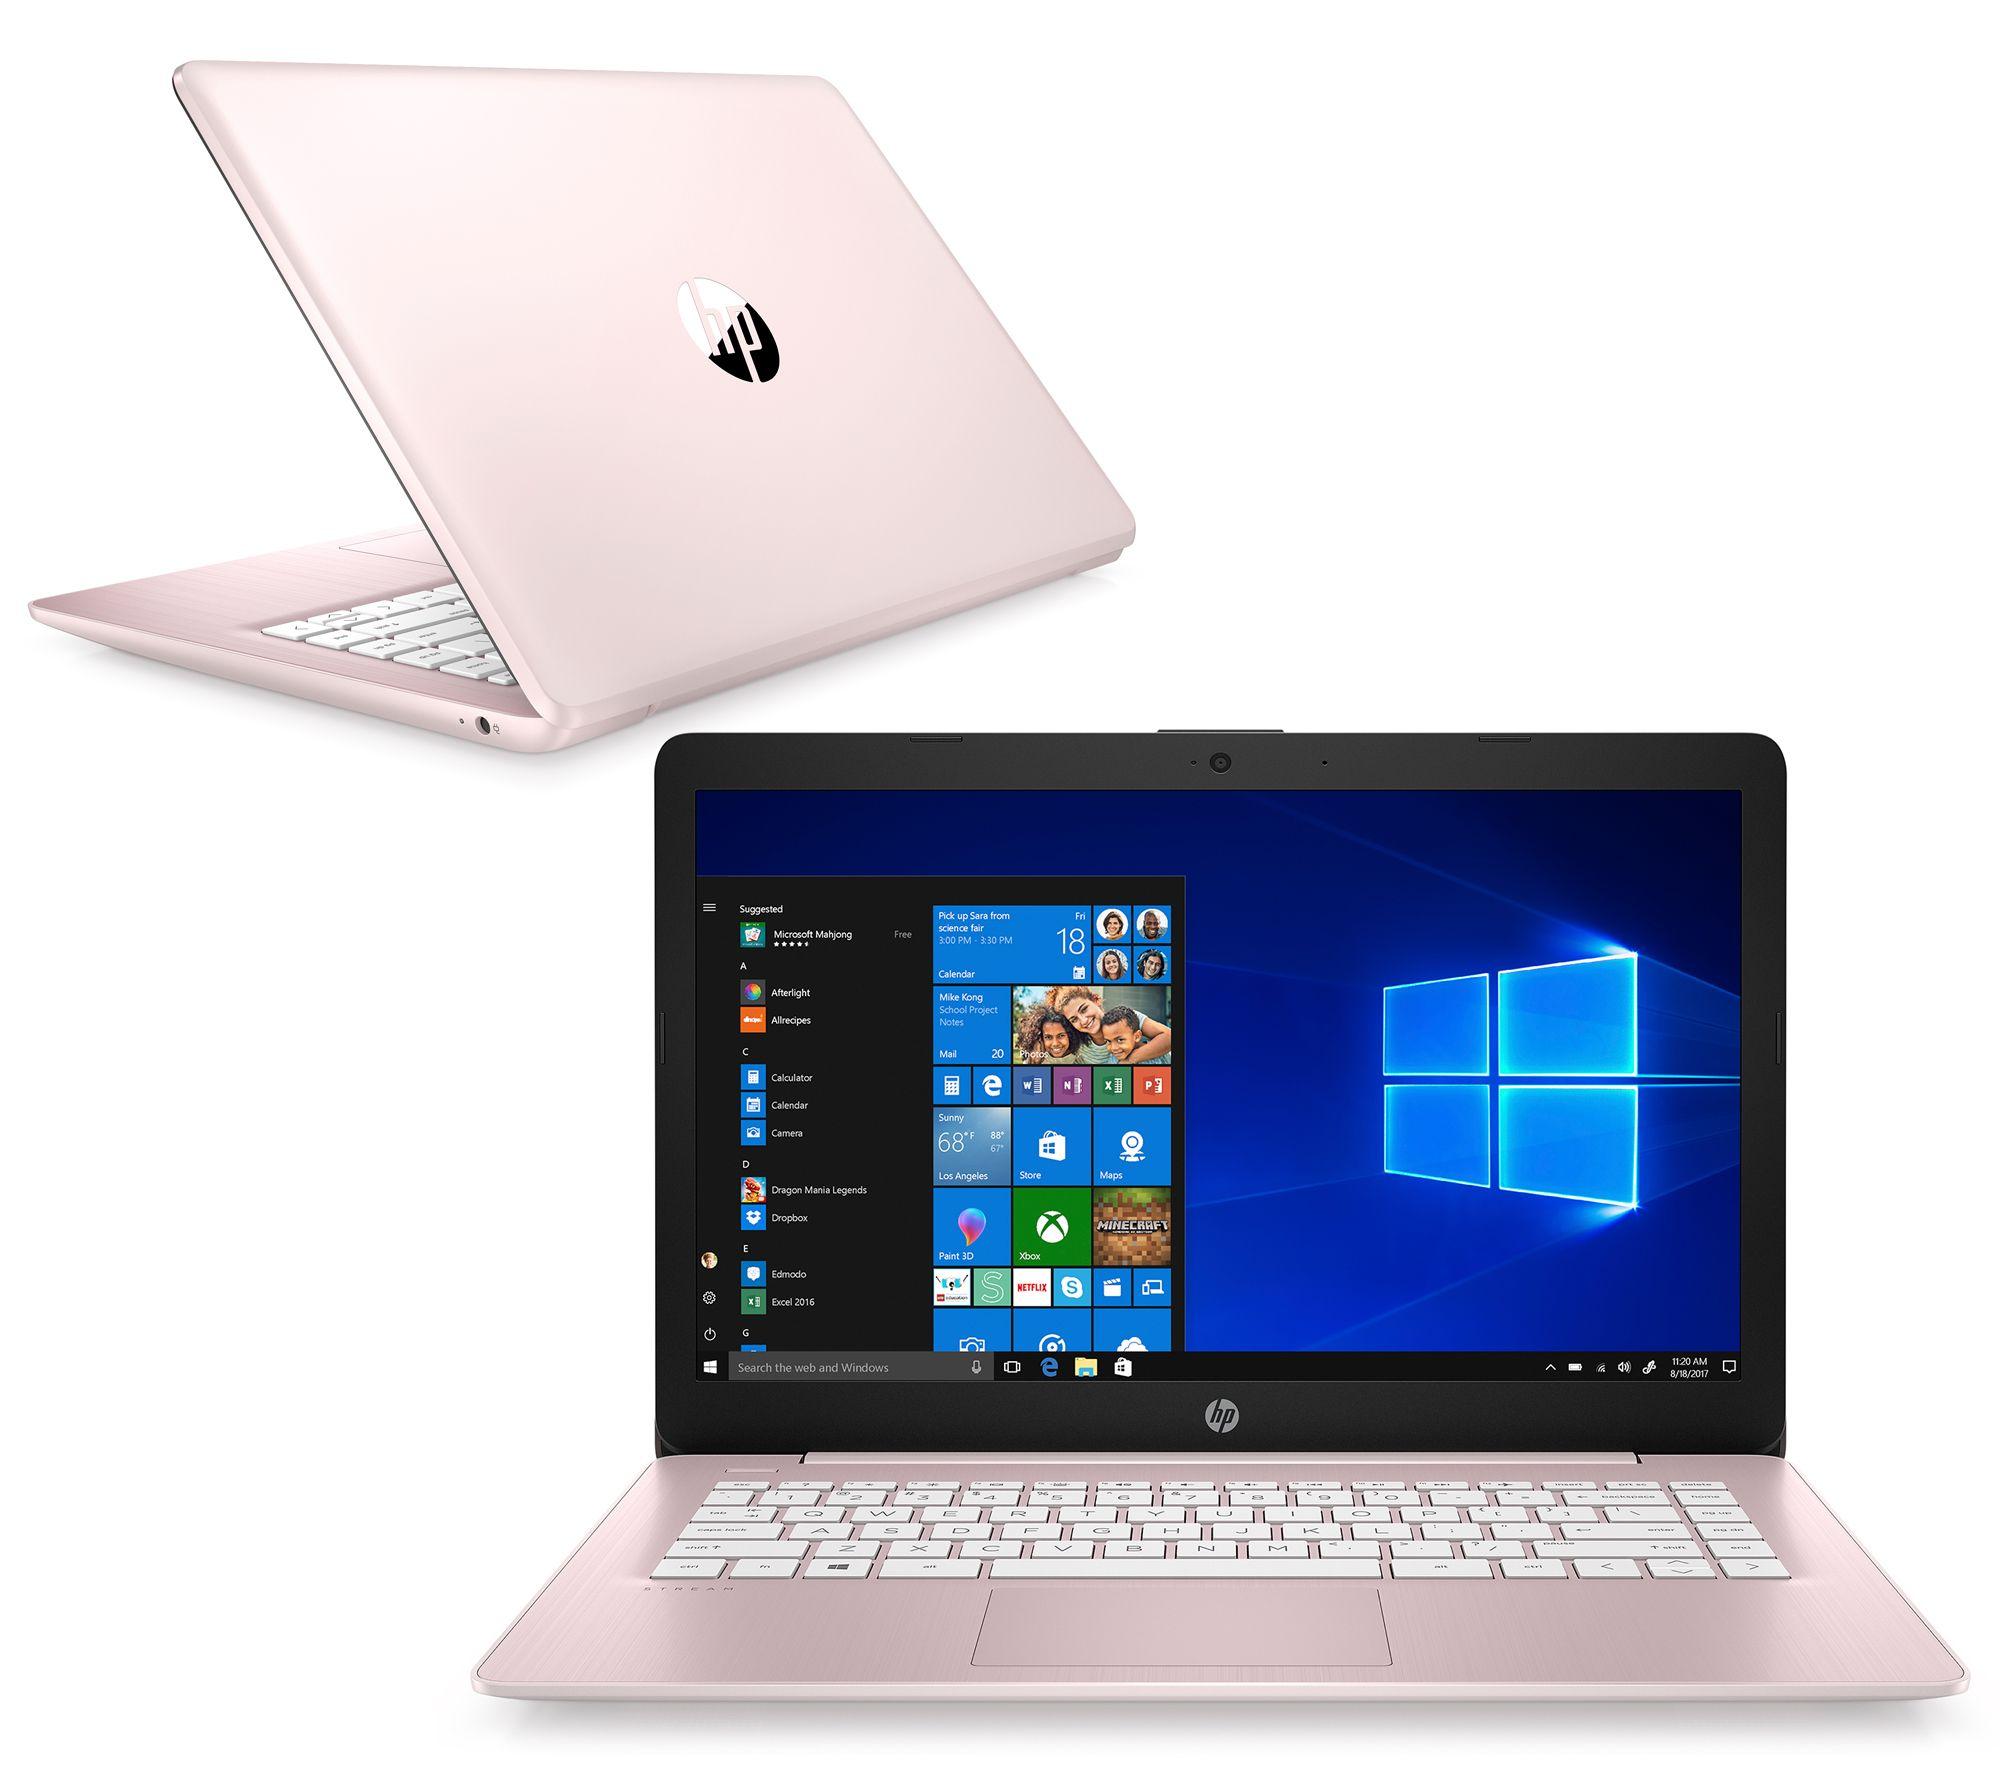 Hp 14 Stream Laptop A4 4gb Ram 64gb Emmc With Office 365 Qvc Com